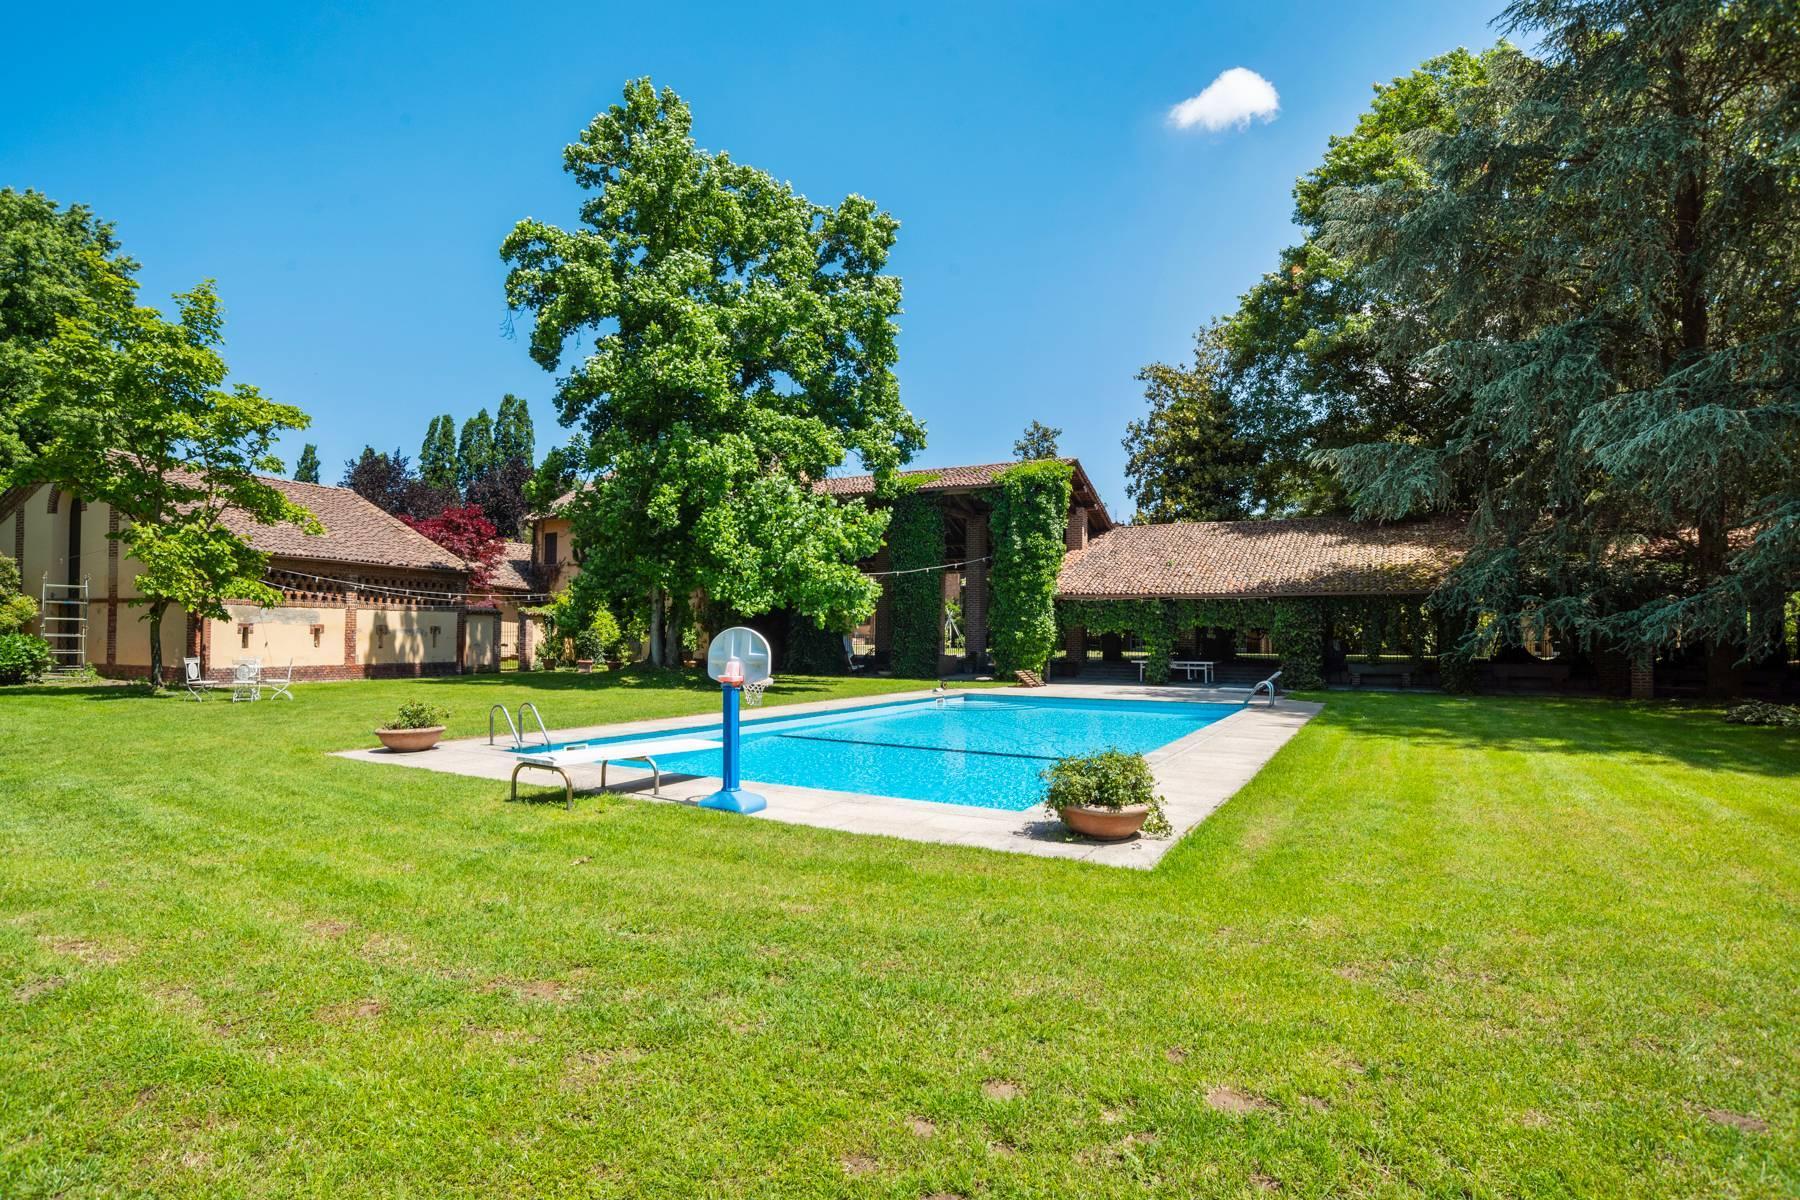 Magnifica proprietà immersa nel verde a Pavia - 12